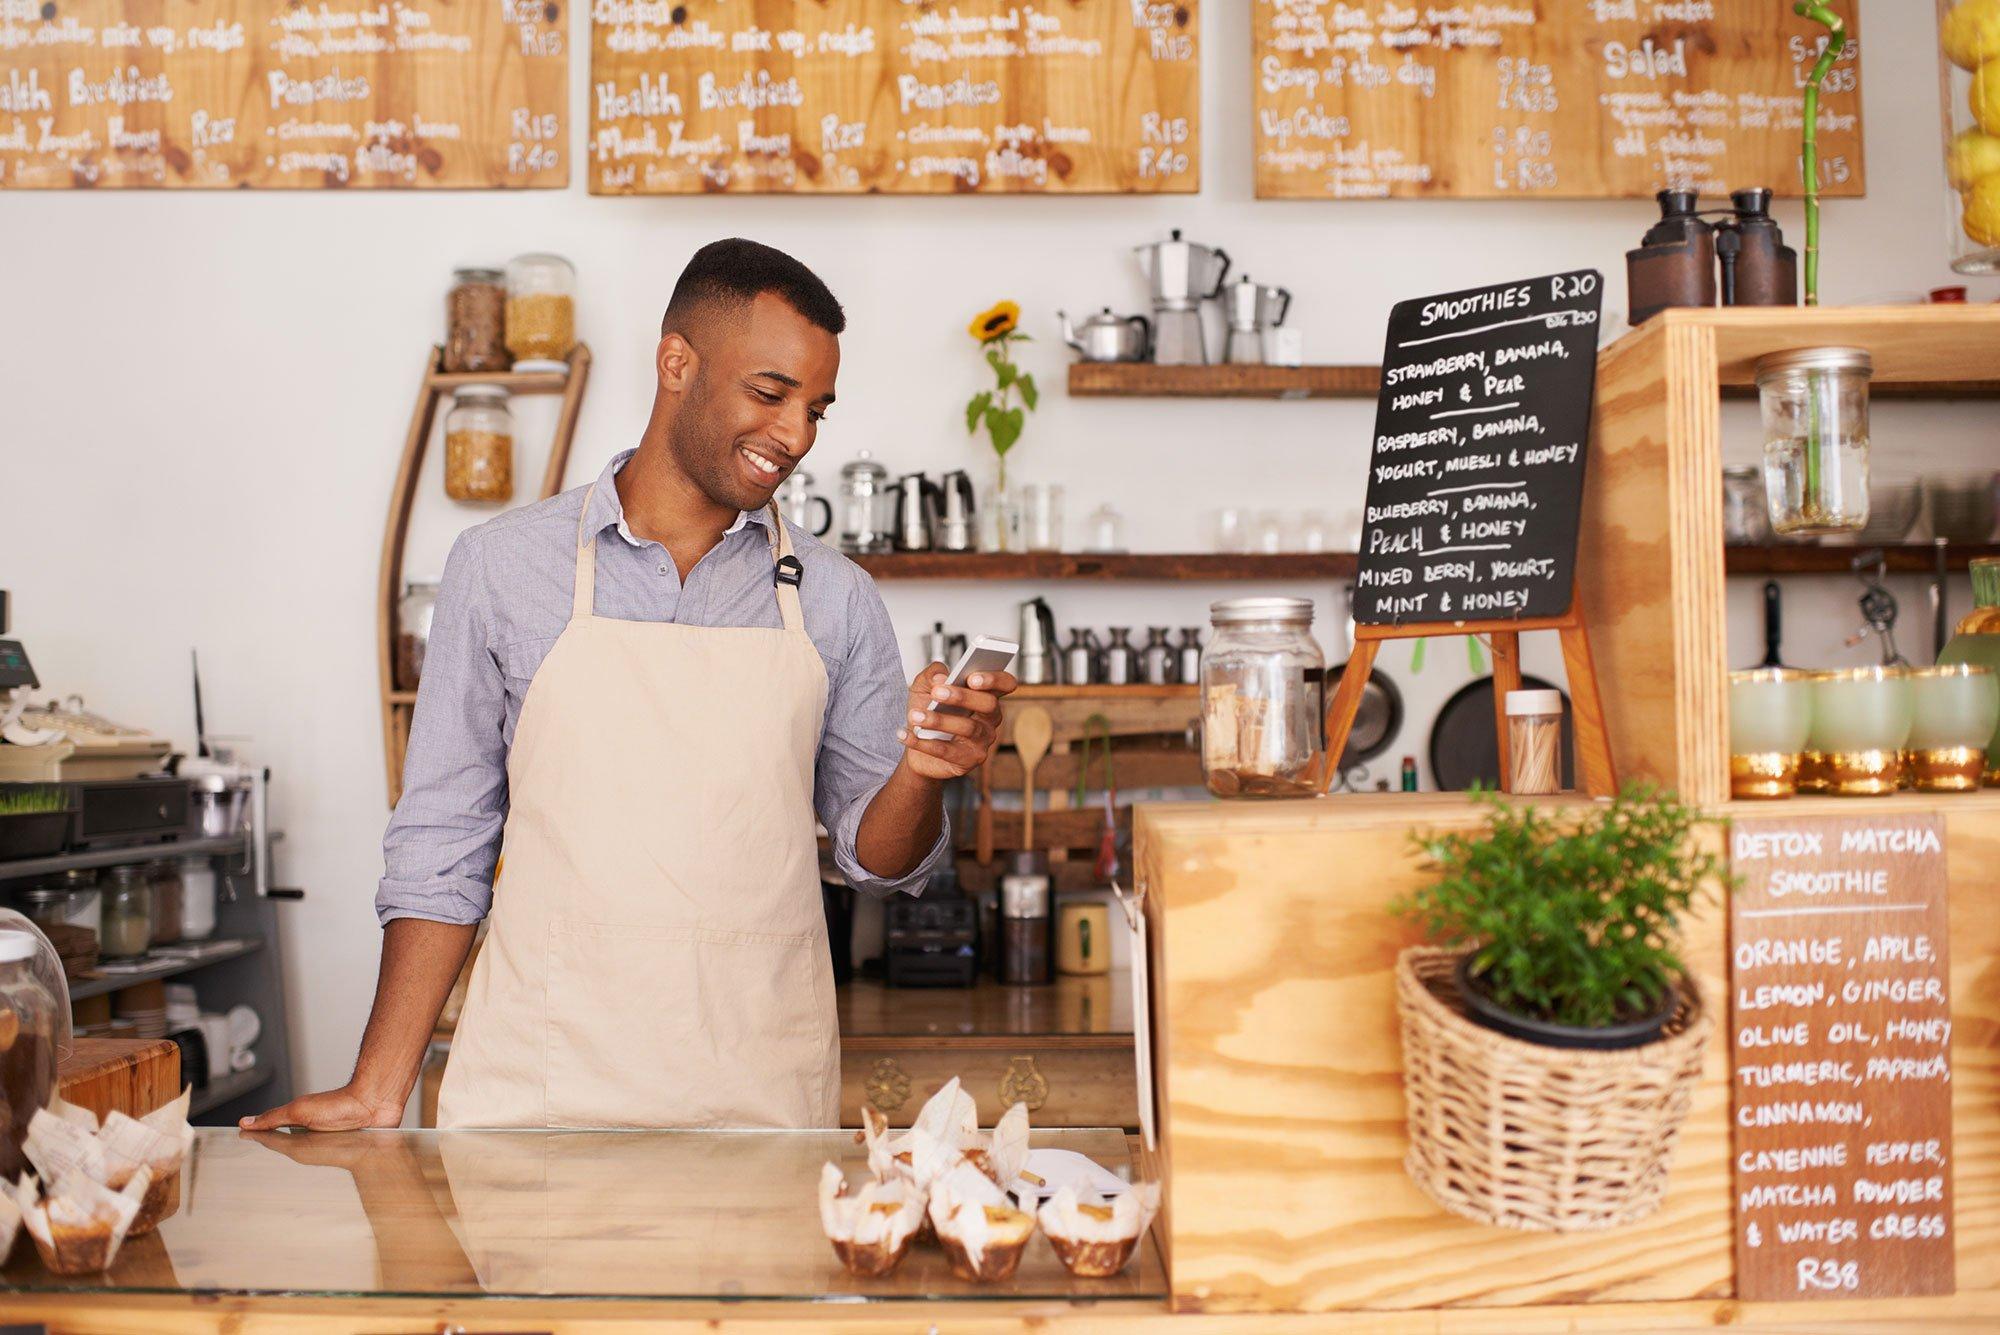 cafe-bakery-employee-using-mobile-phone